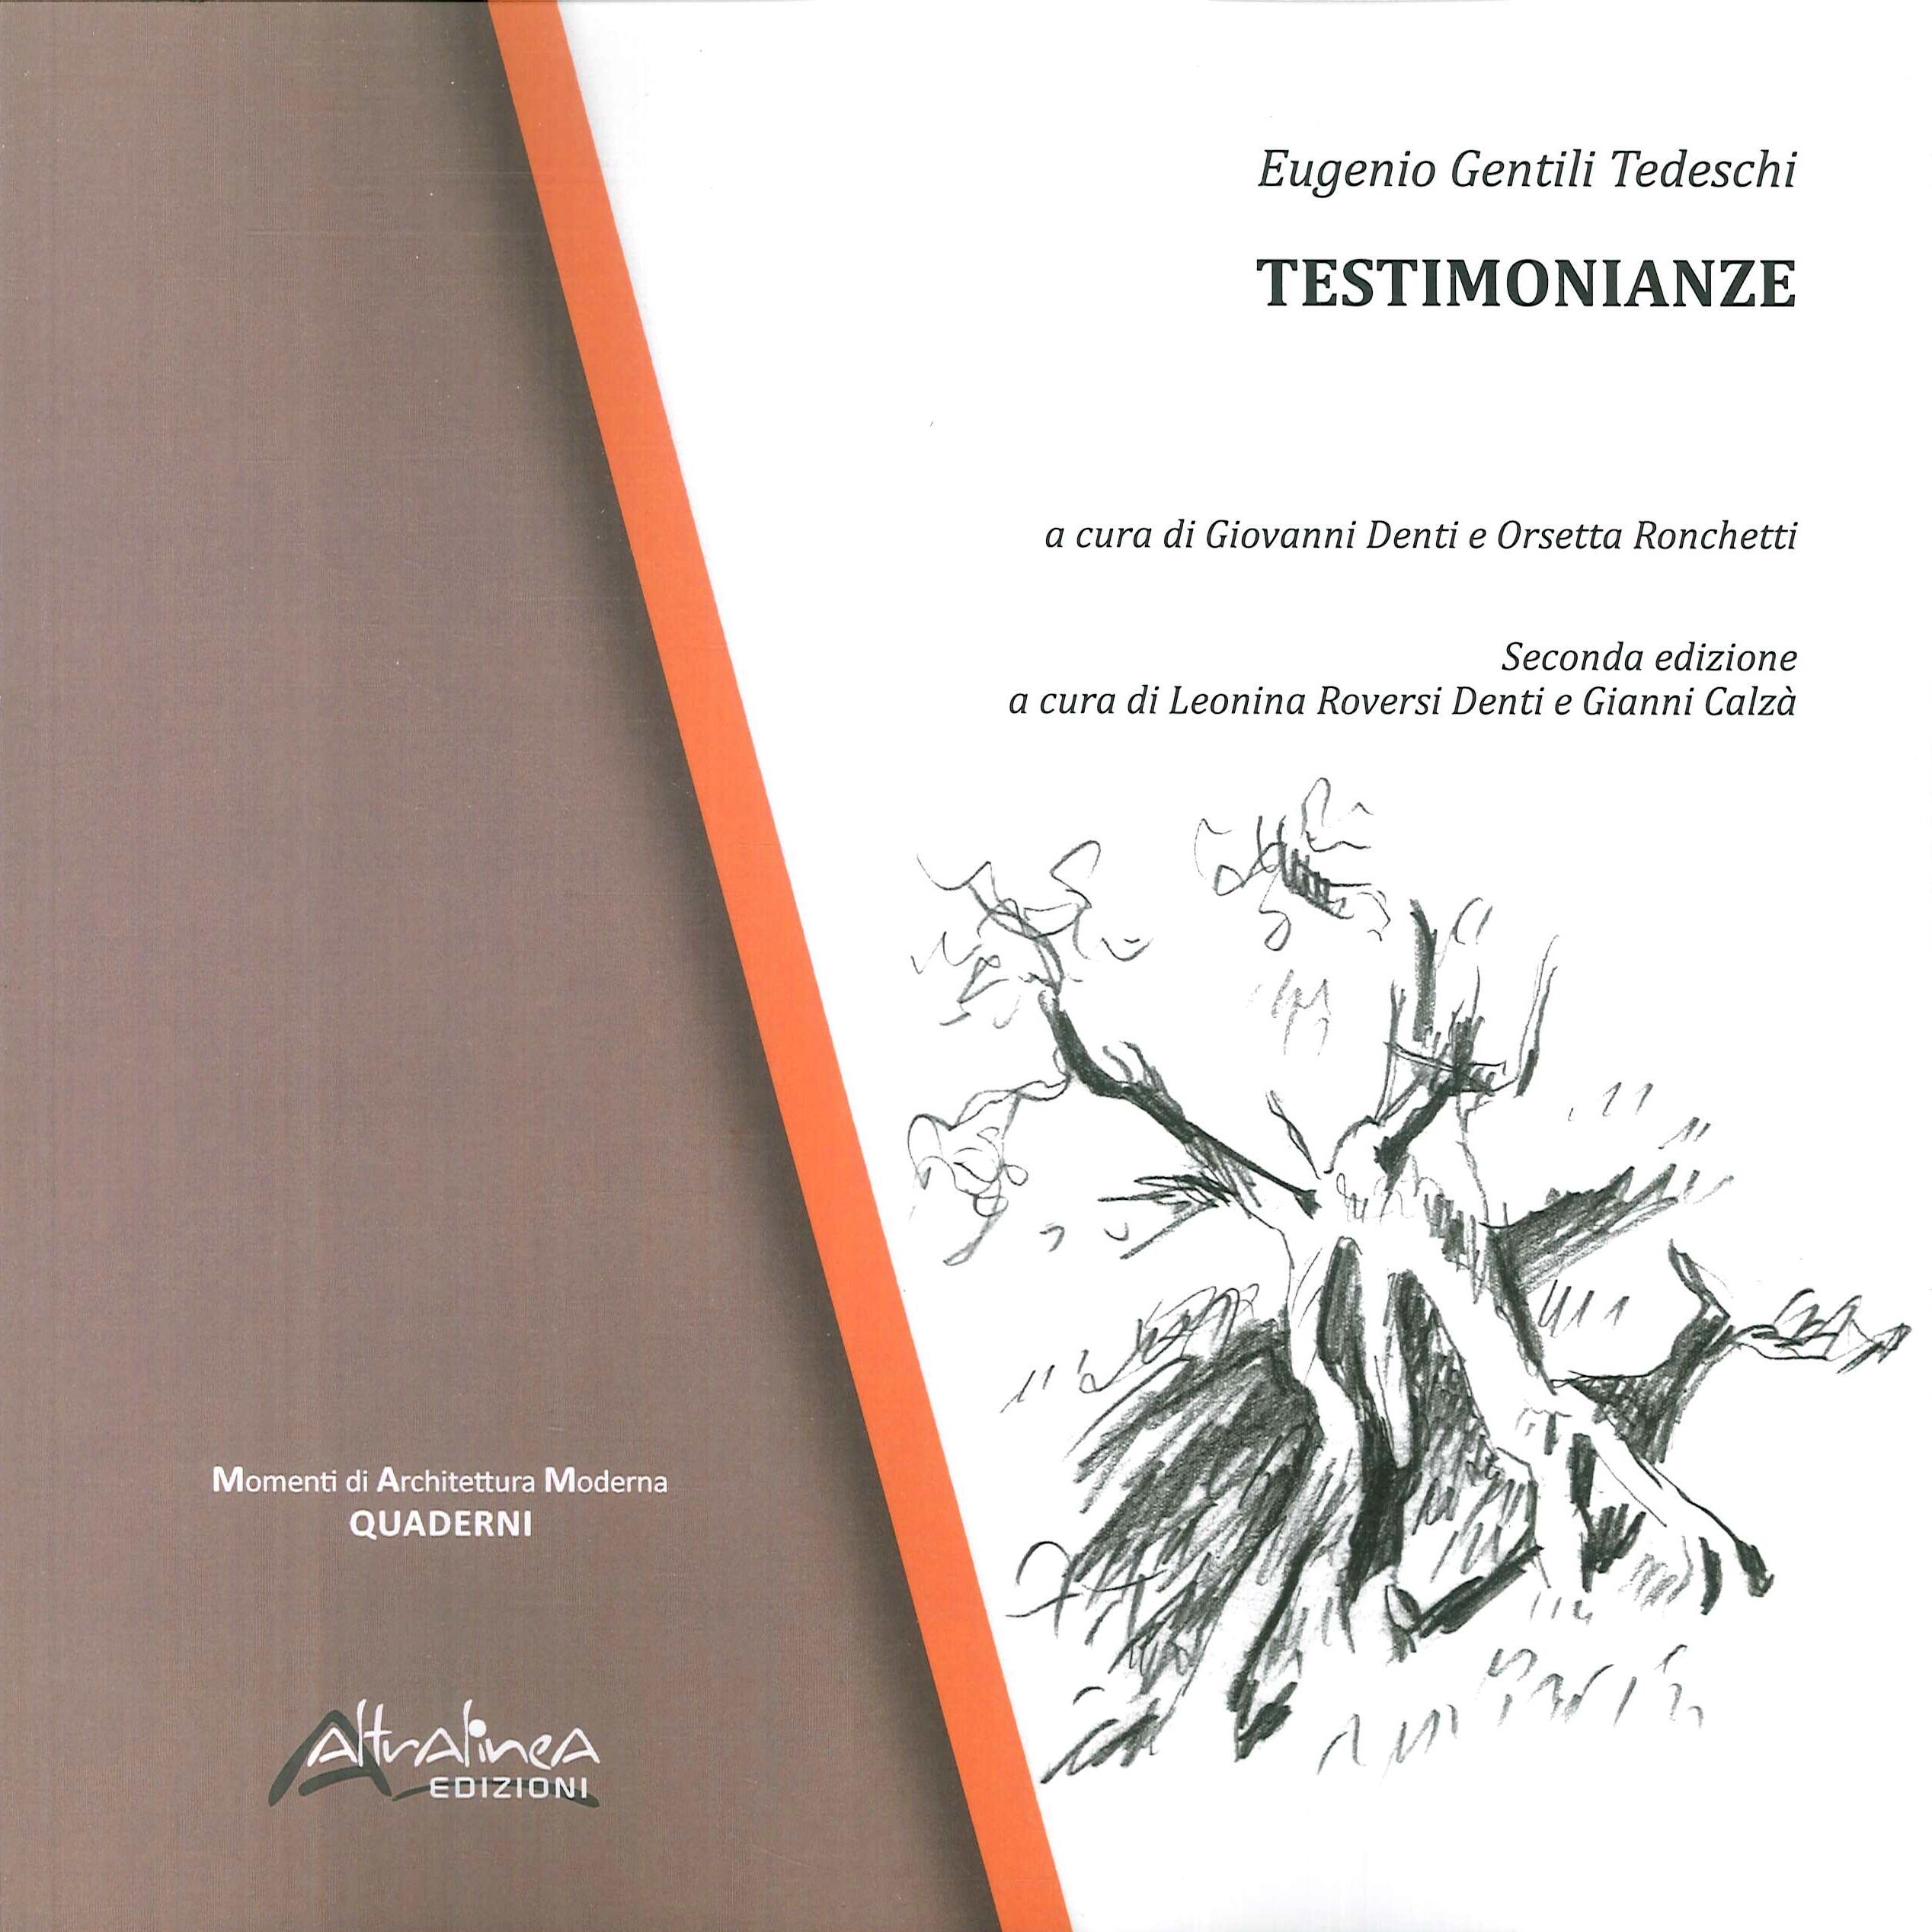 Eugenio Gentili Tedeschi. Testimonianze